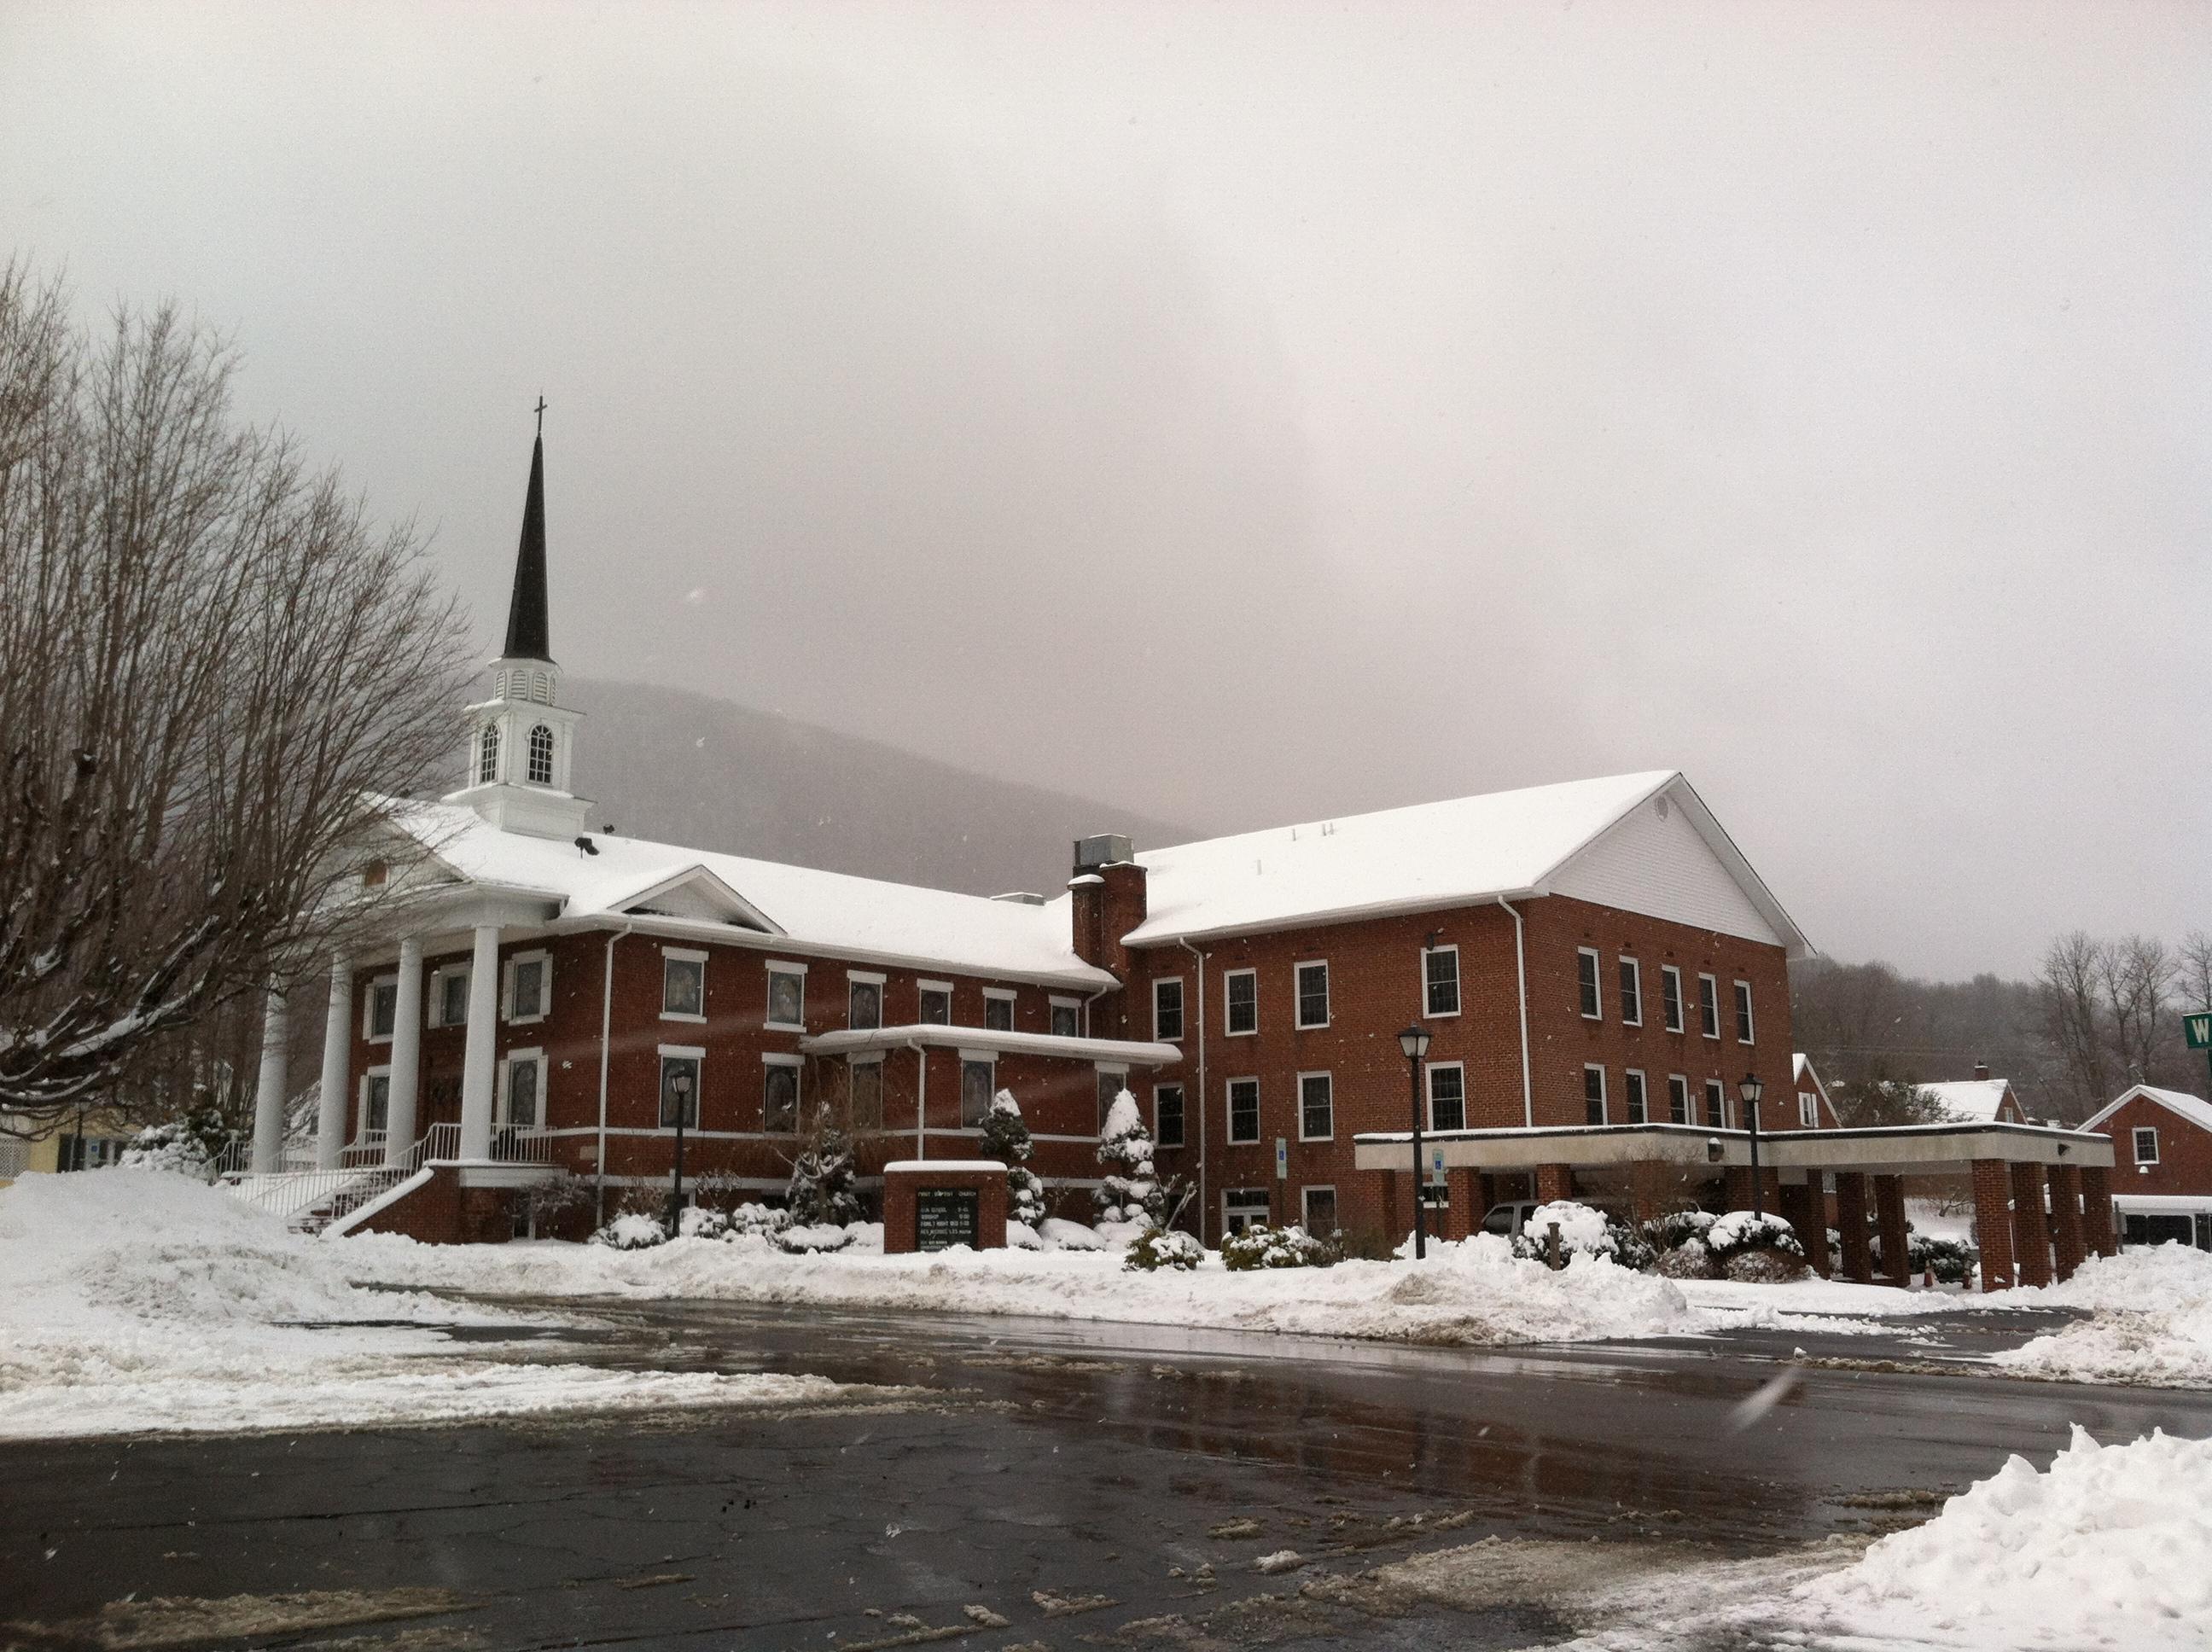 FBCWJ Winter 2013